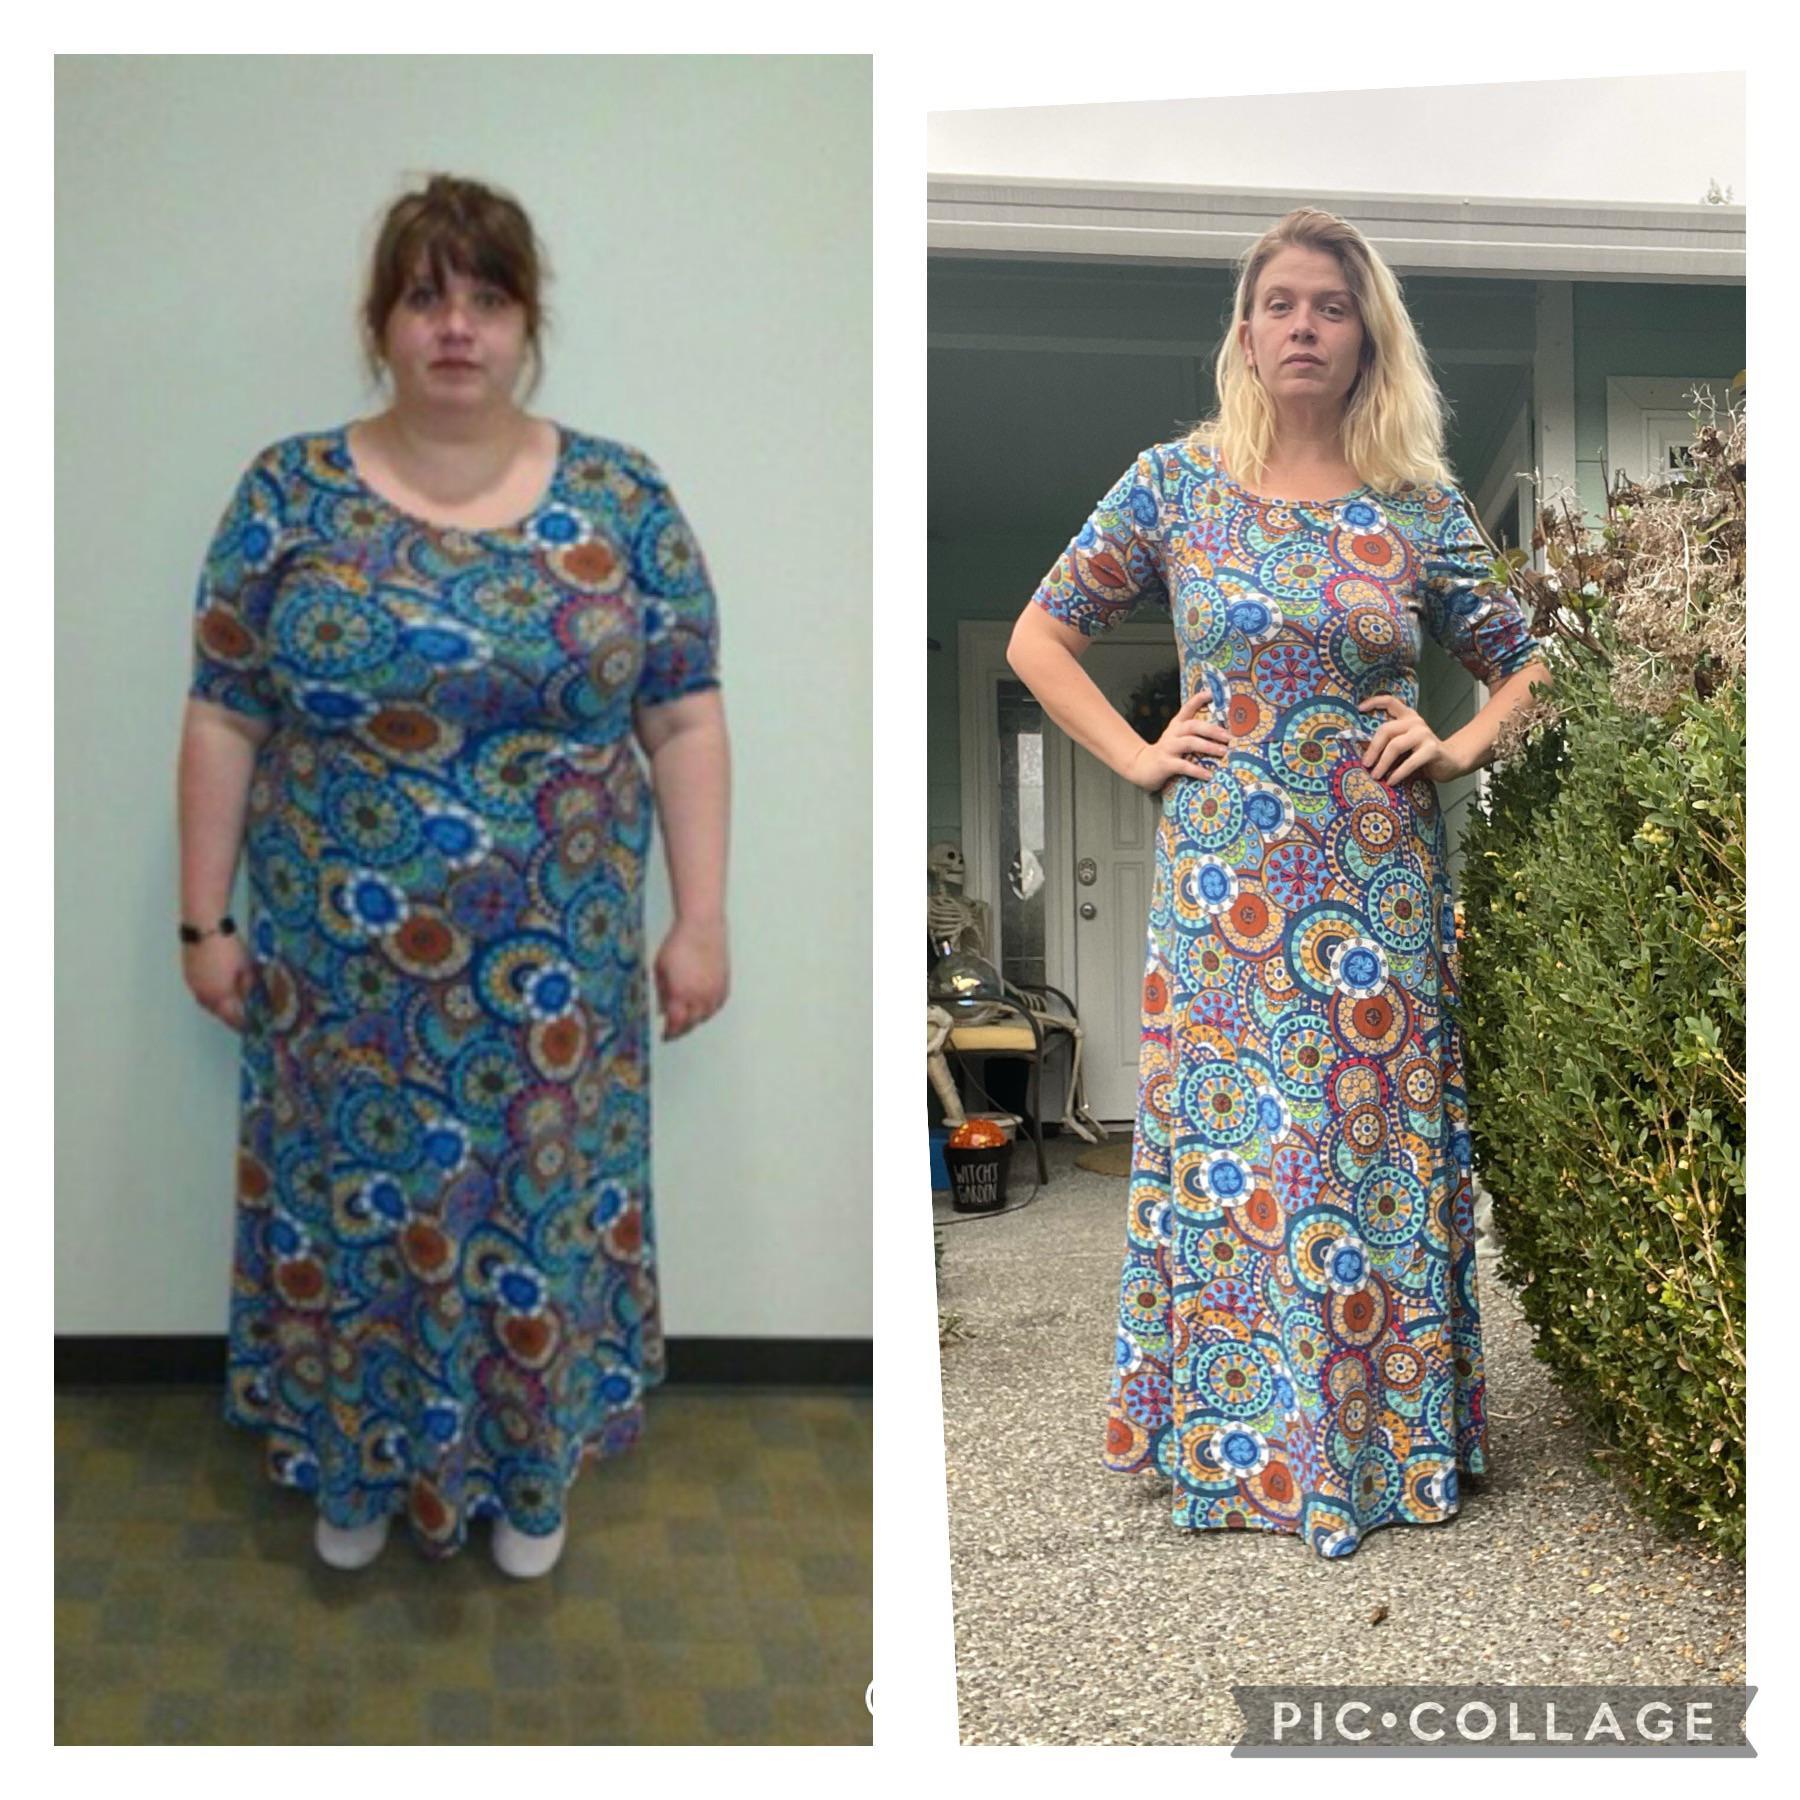 5'7 Female 134 lbs Fat Loss 298 lbs to 164 lbs